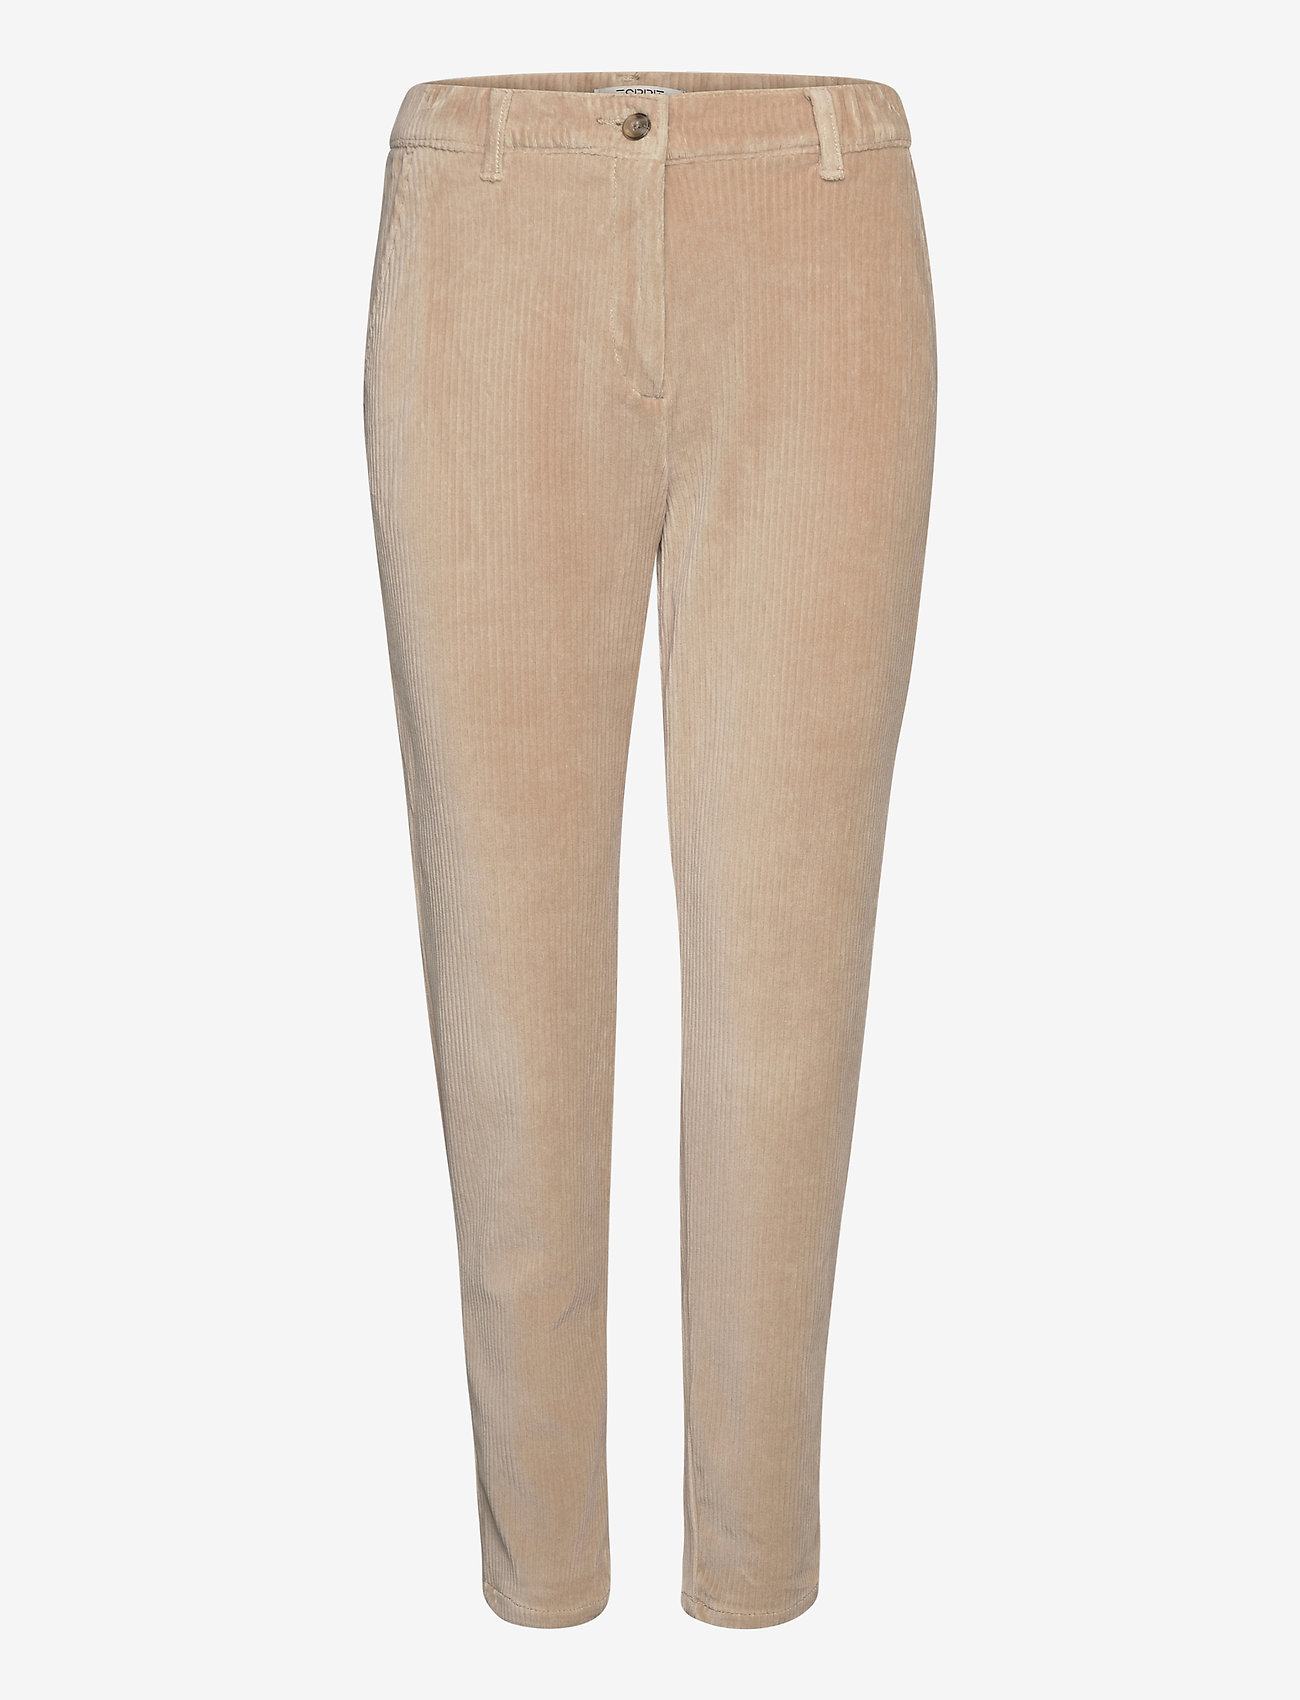 Esprit Casual - Pants woven - straight jeans - cream beige - 0